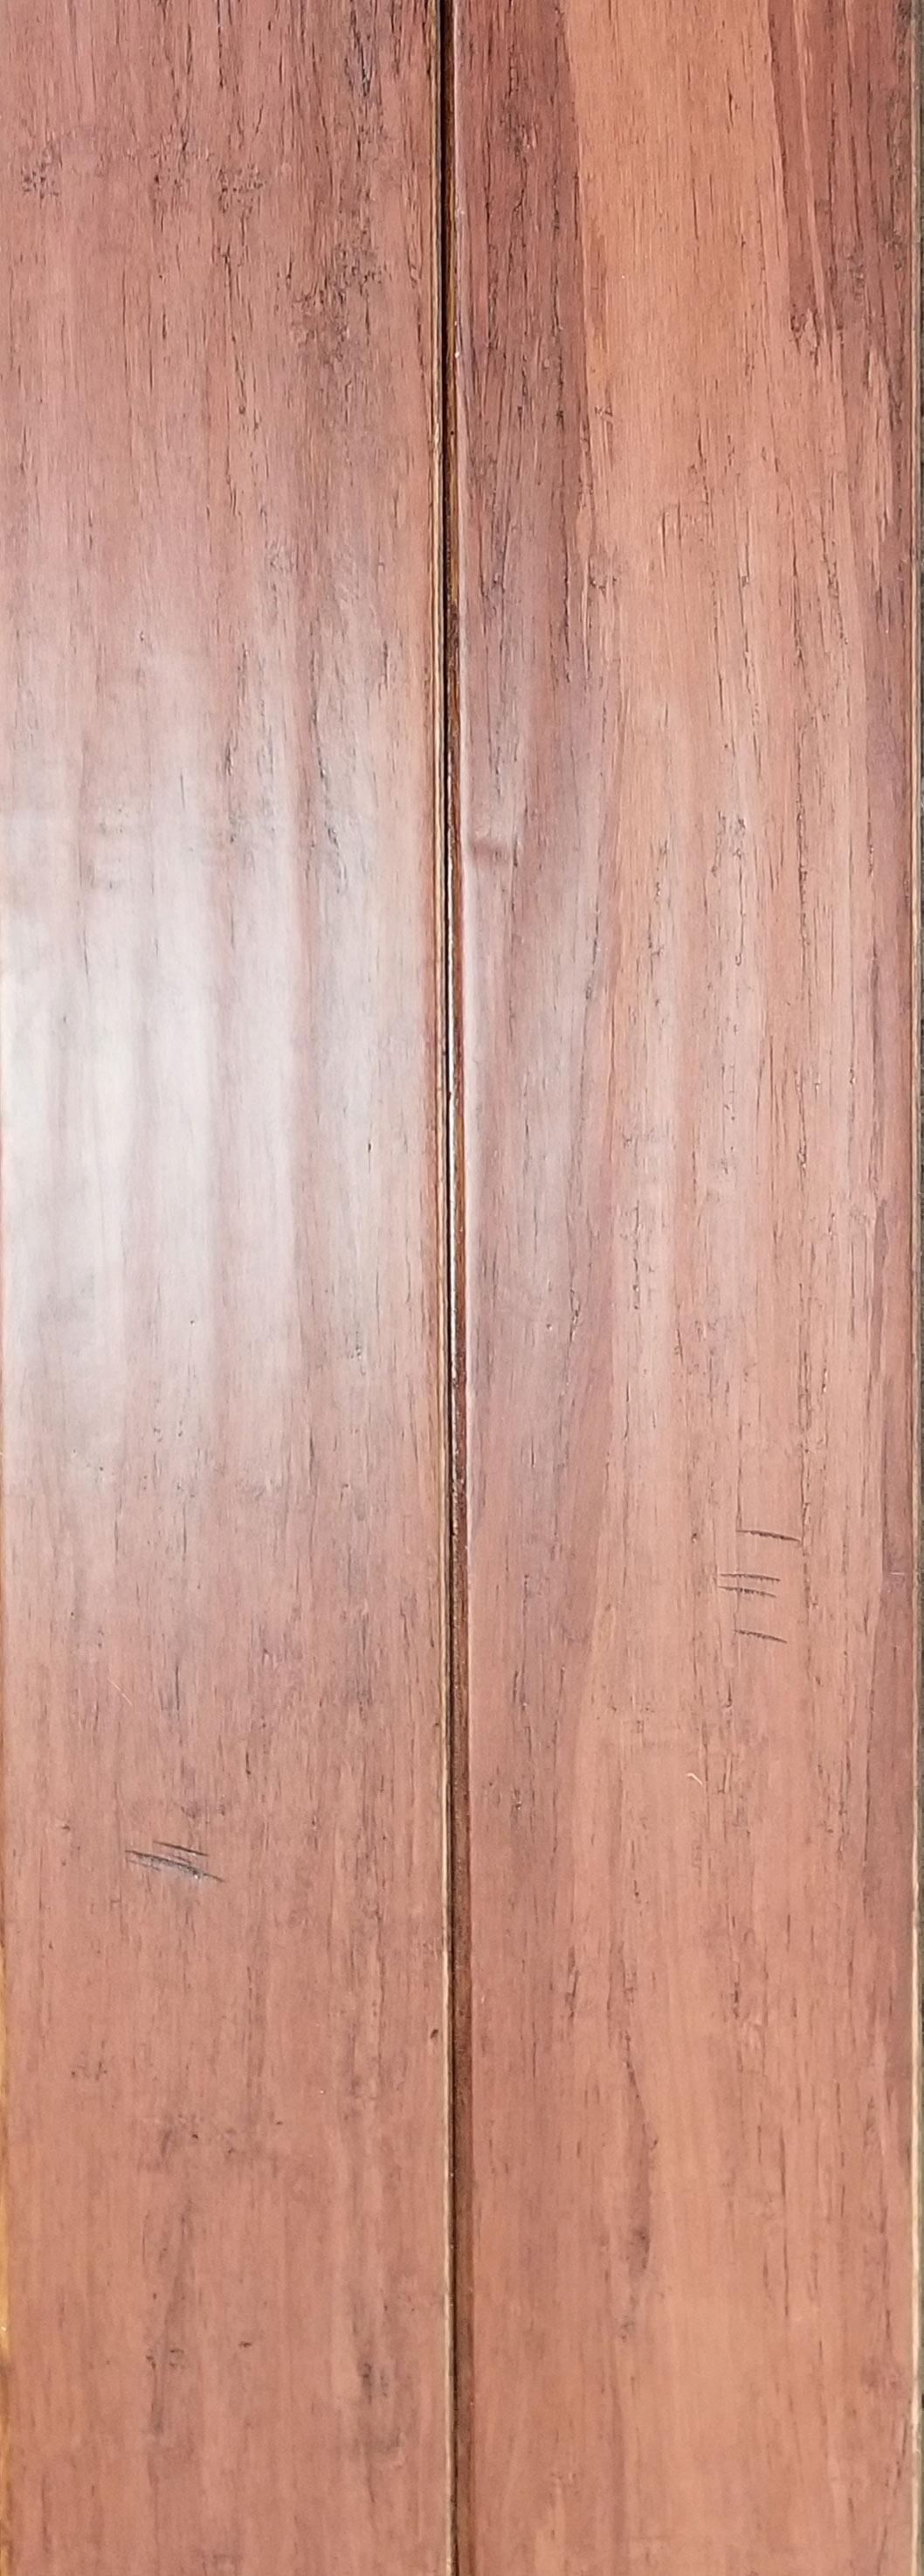 Hardwood Floor Petersburg Clearwater Amp Eutis